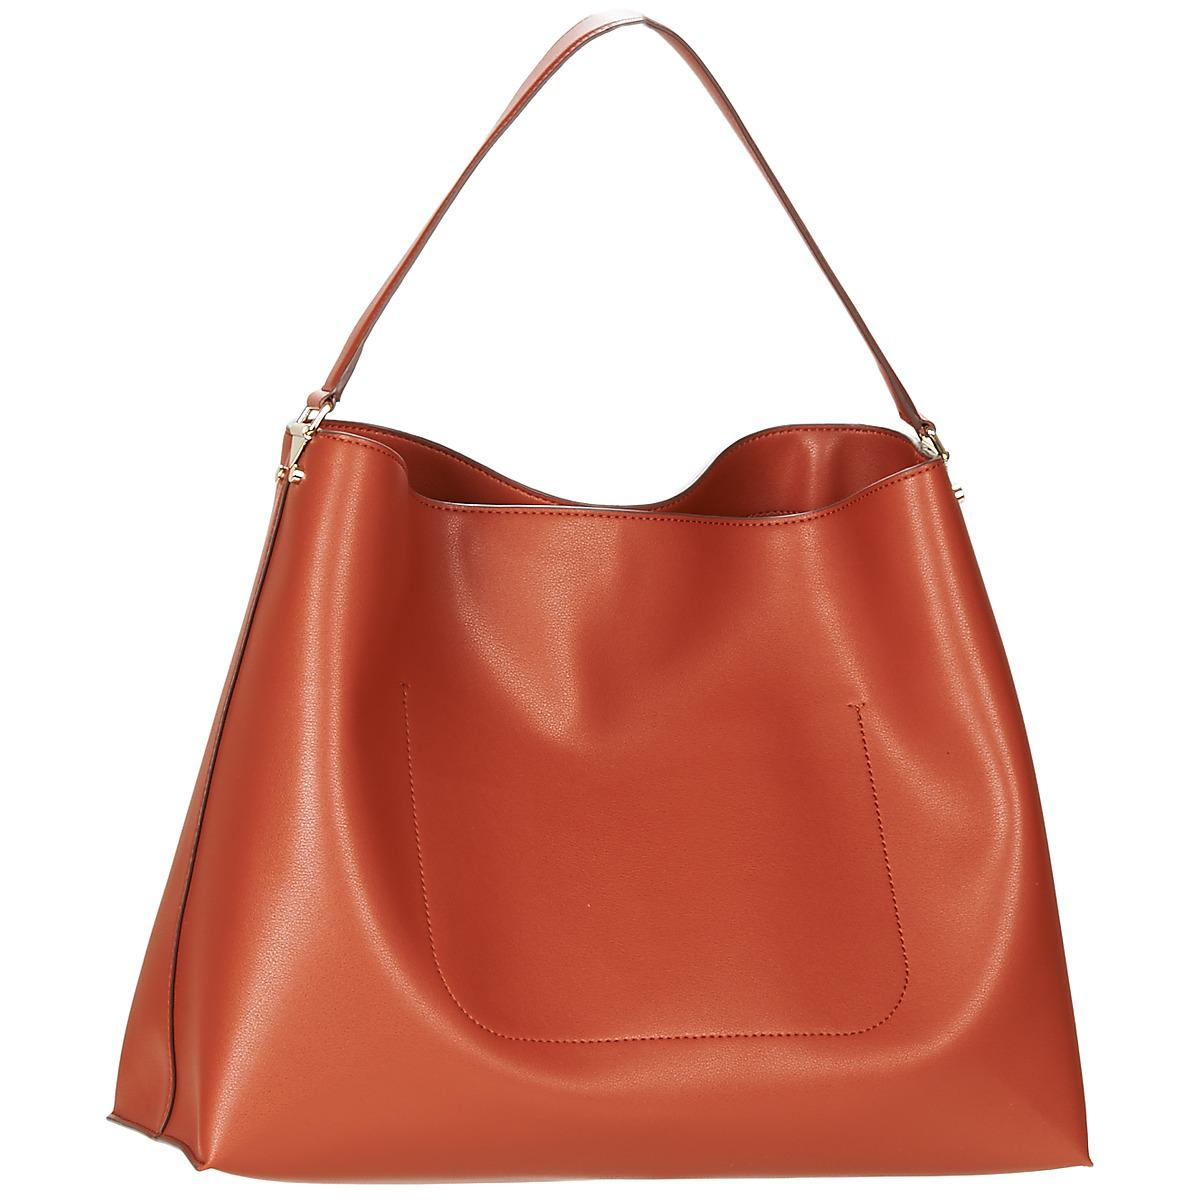 Emporio Armani Nellie Hobo Women s Shoulder Bag In Beige in Natural ... 554ea8c33c9b8